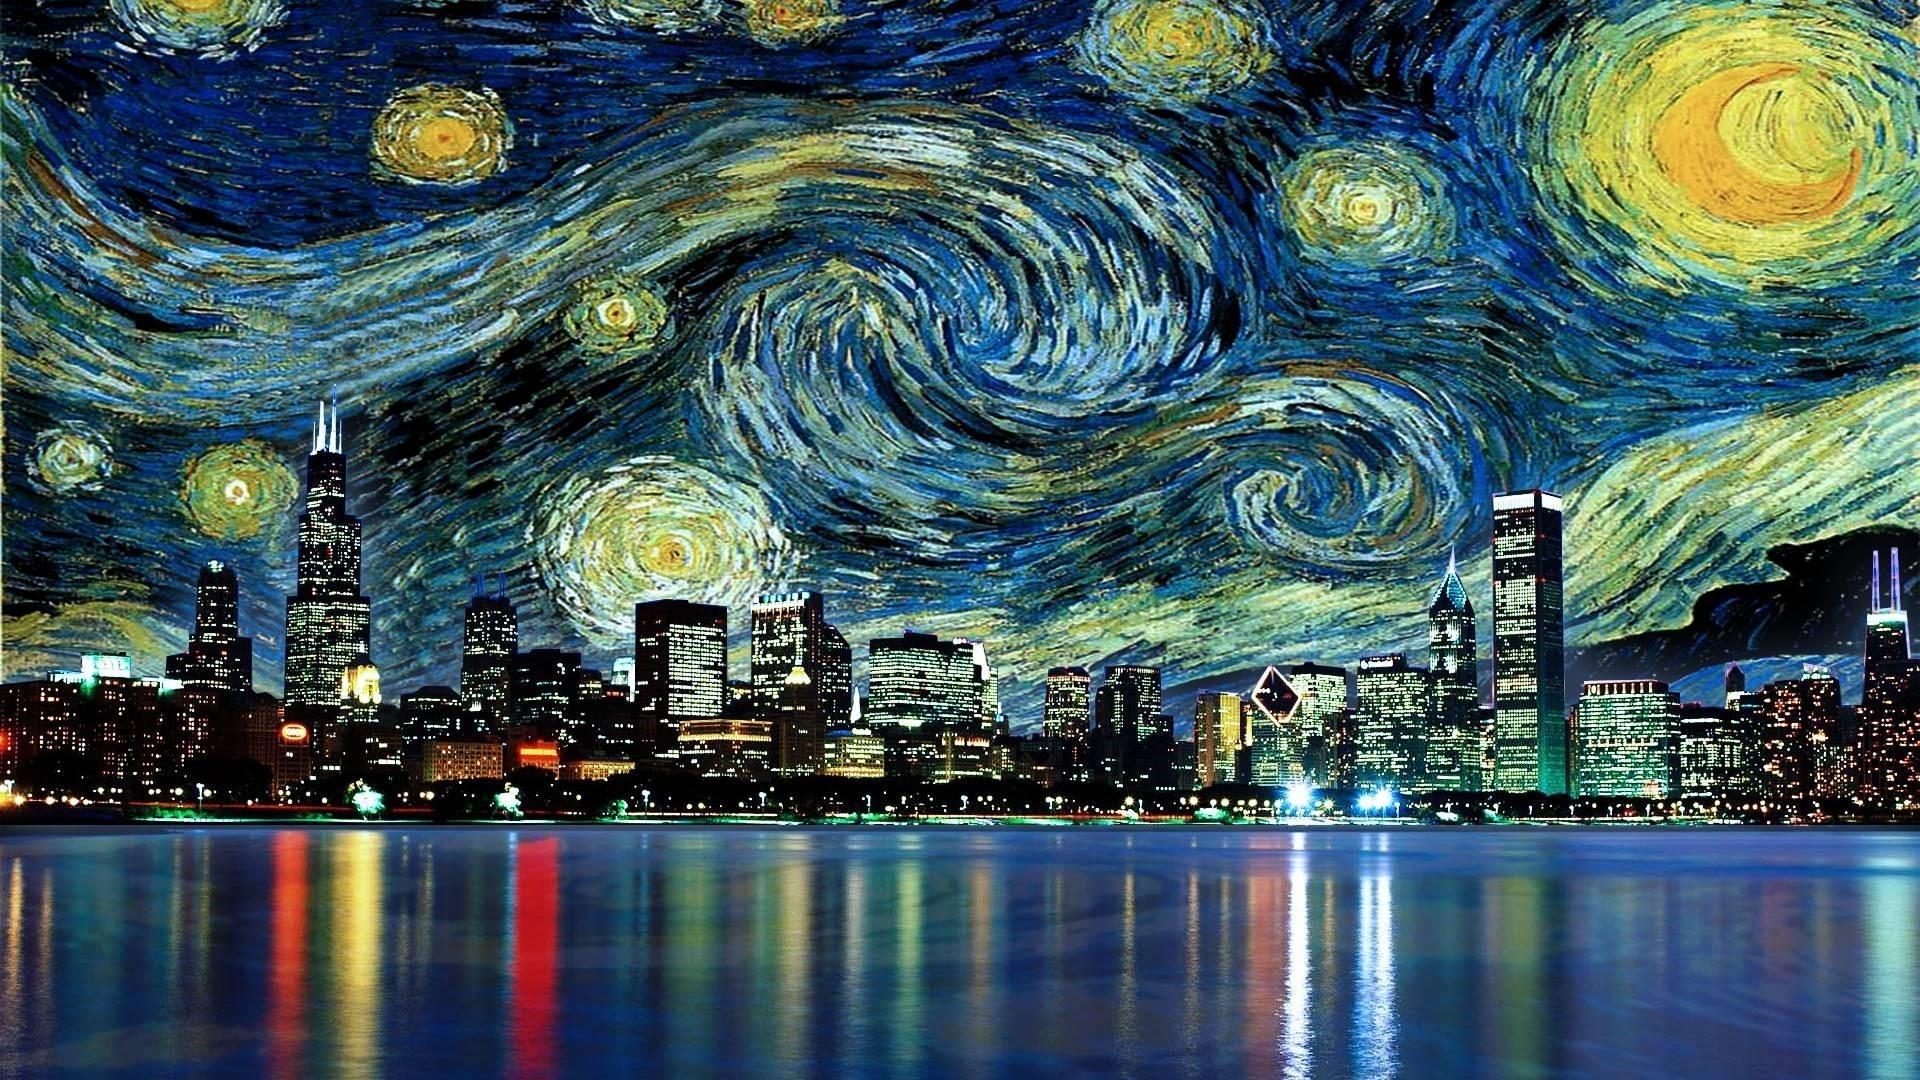 10 Best Starry Night Desktop Wallpaper Full Hd 1080p For Pc